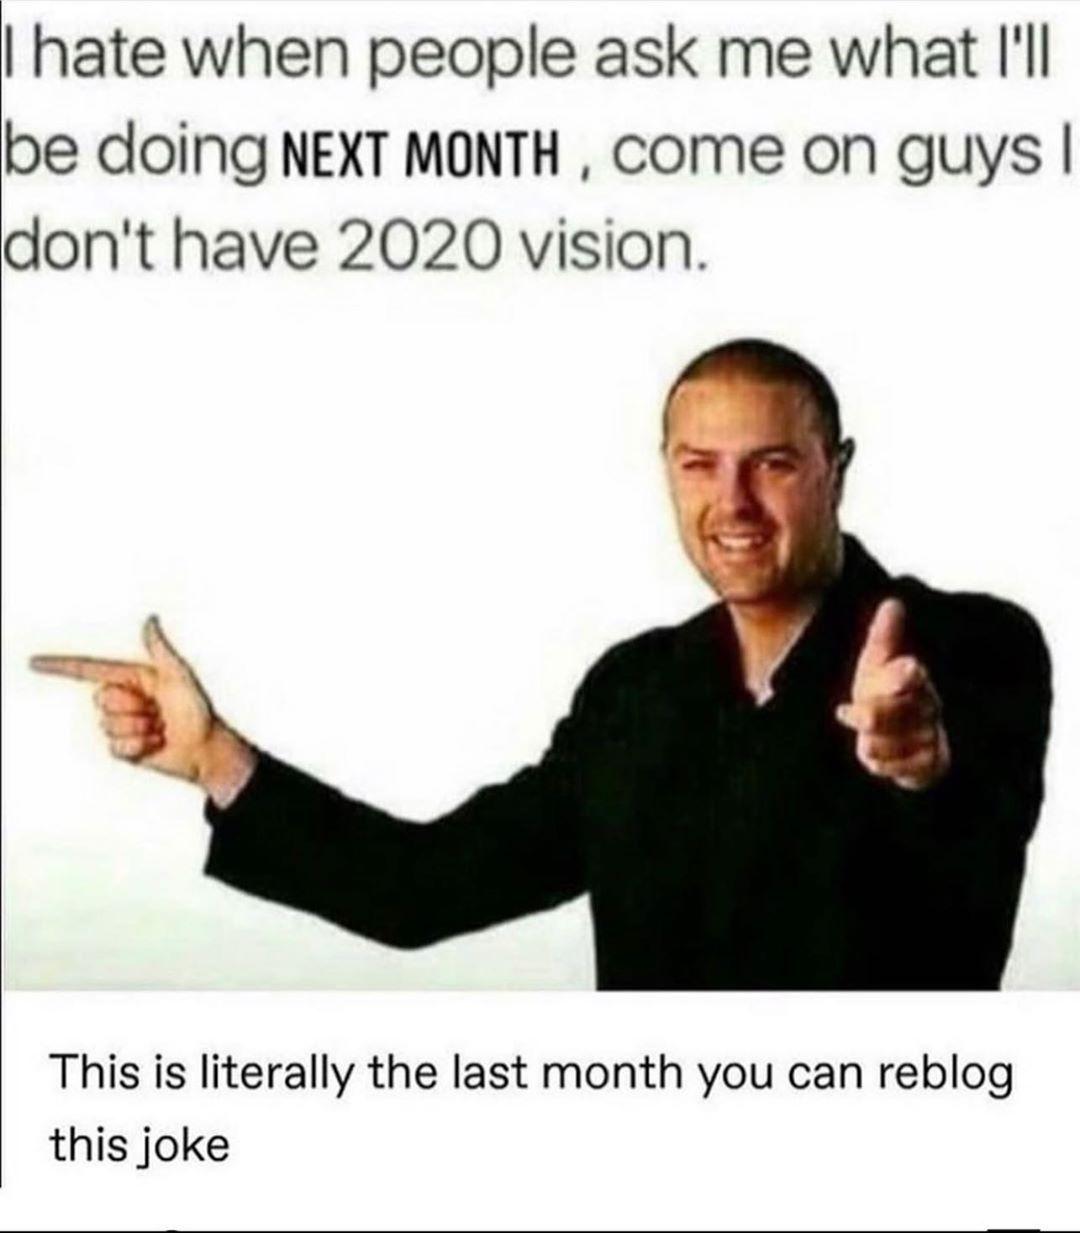 Memes Memesdaily Memestagram Memesfordays Memestar Memesita Memester Memesdank Memeslut Memesitalia Funny New Years Memes Memes New Year Meme